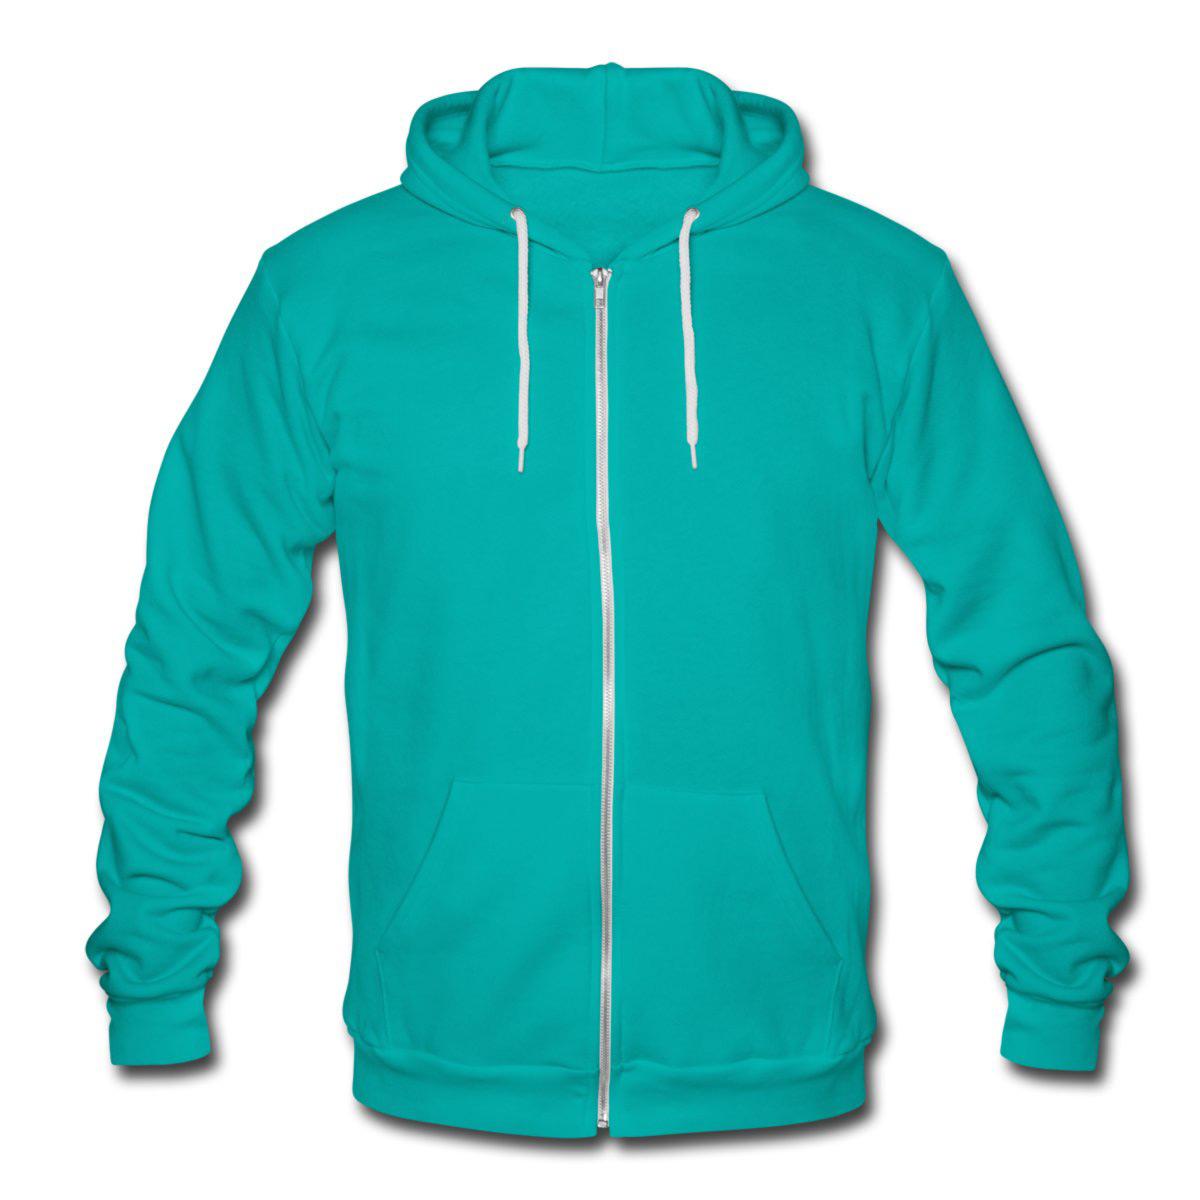 sweatshirt jacke bedrucken günstig